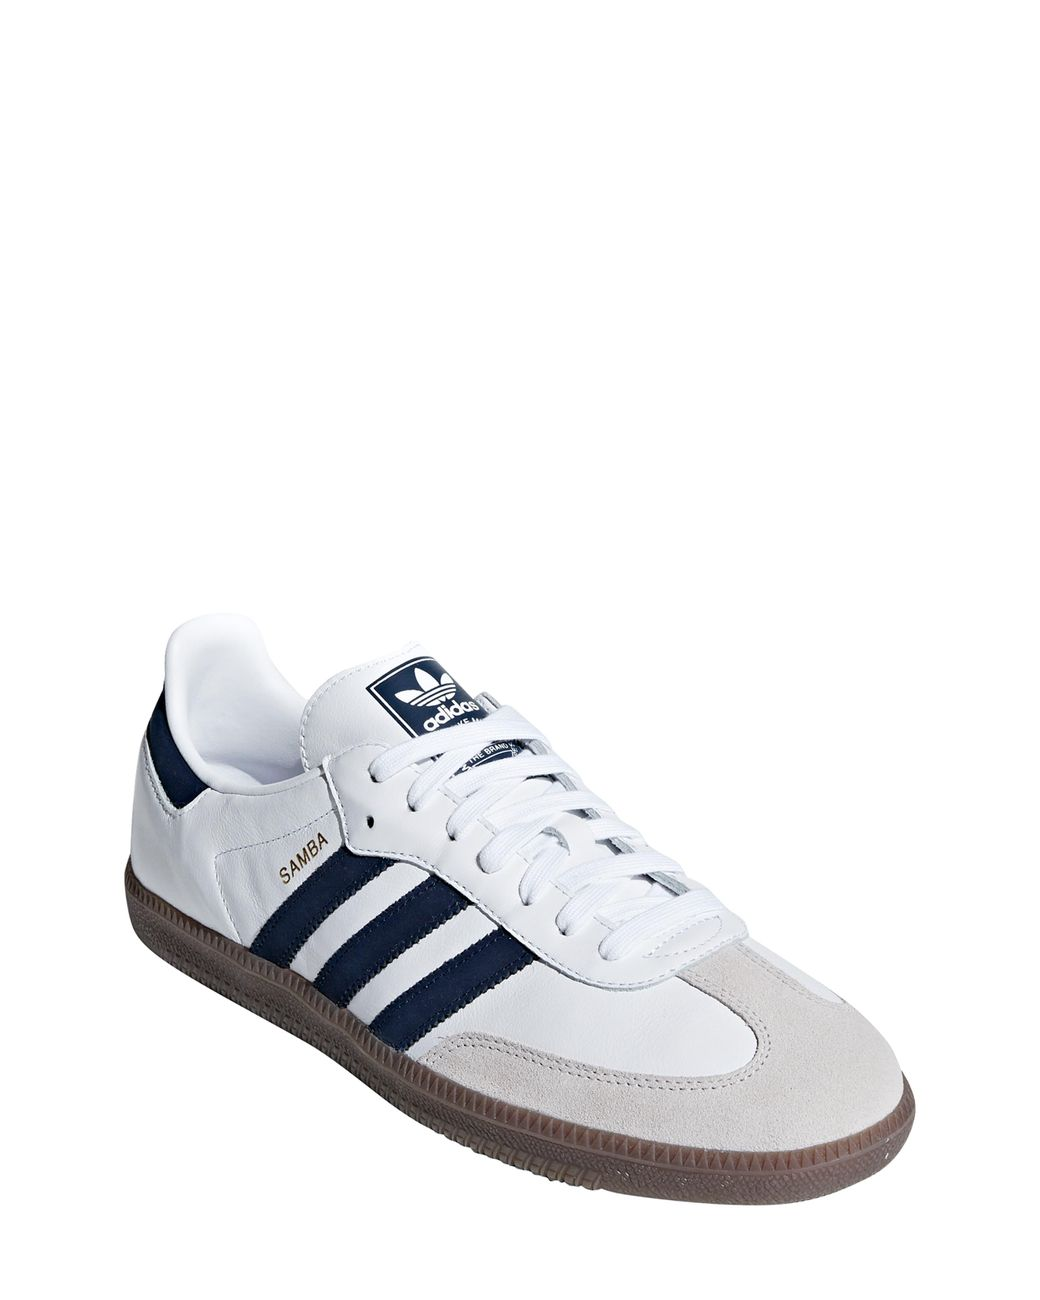 adidas samba navy